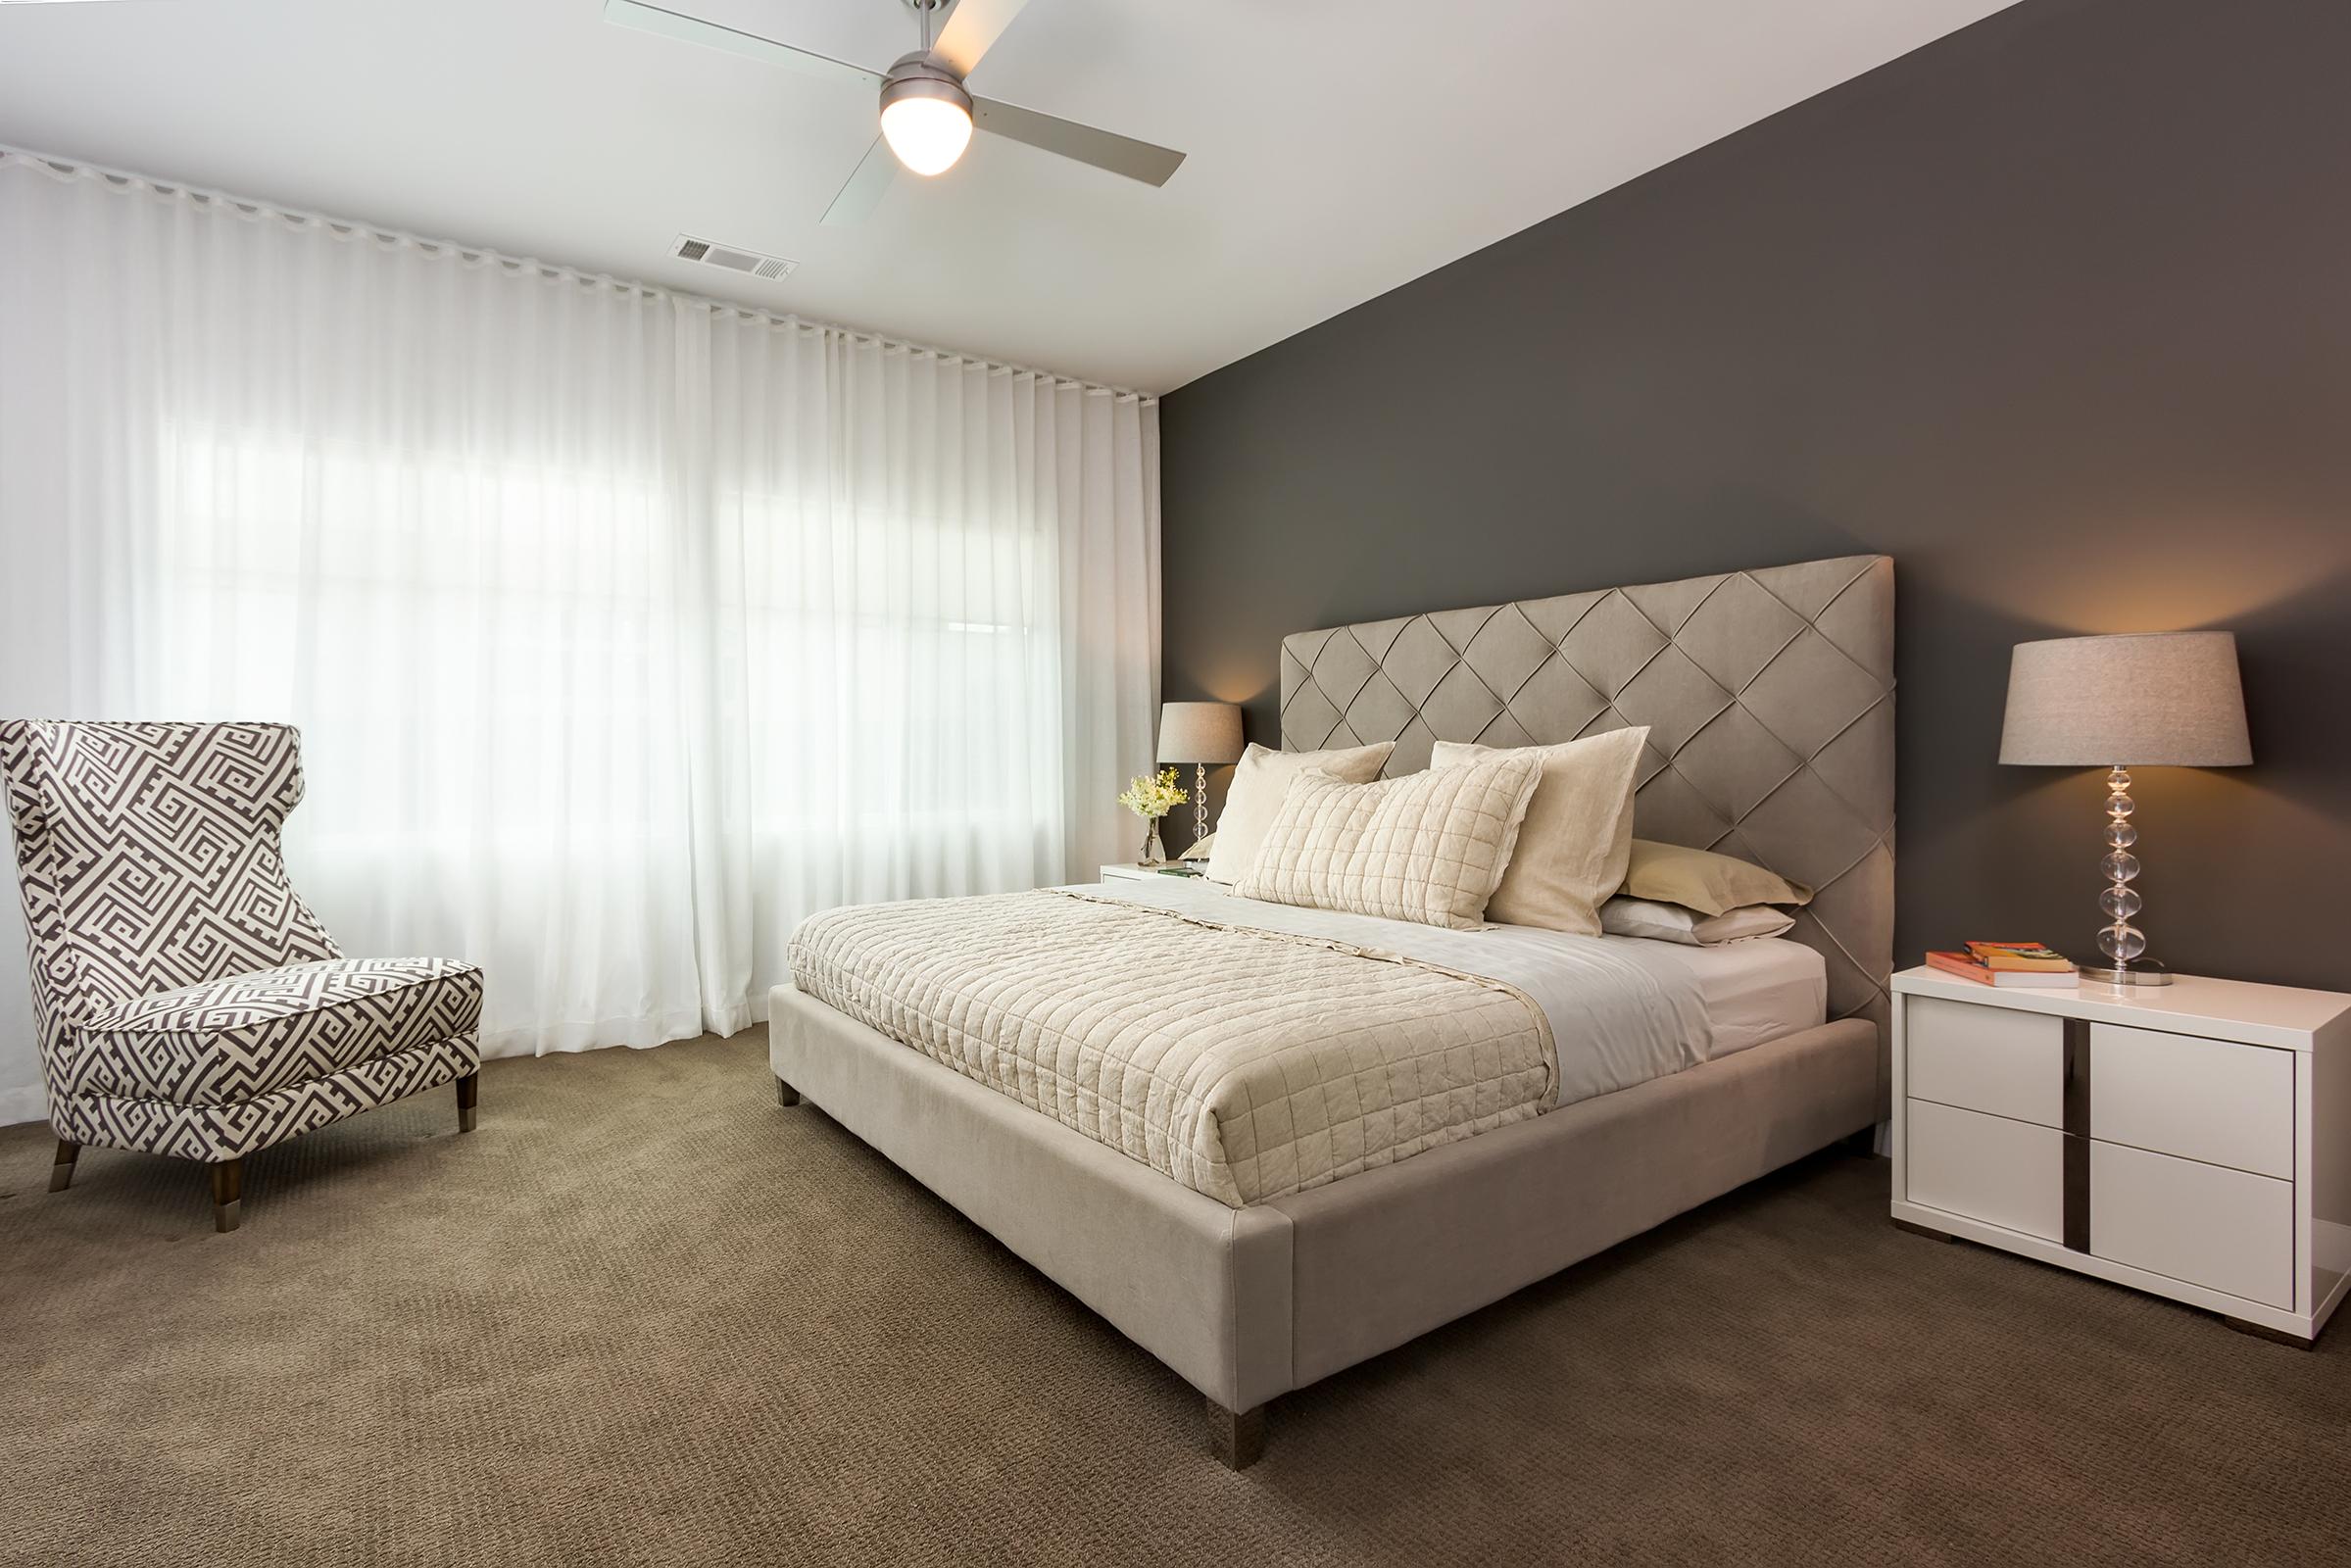 031 1307 Axis_Master Bedroom 1.jpg